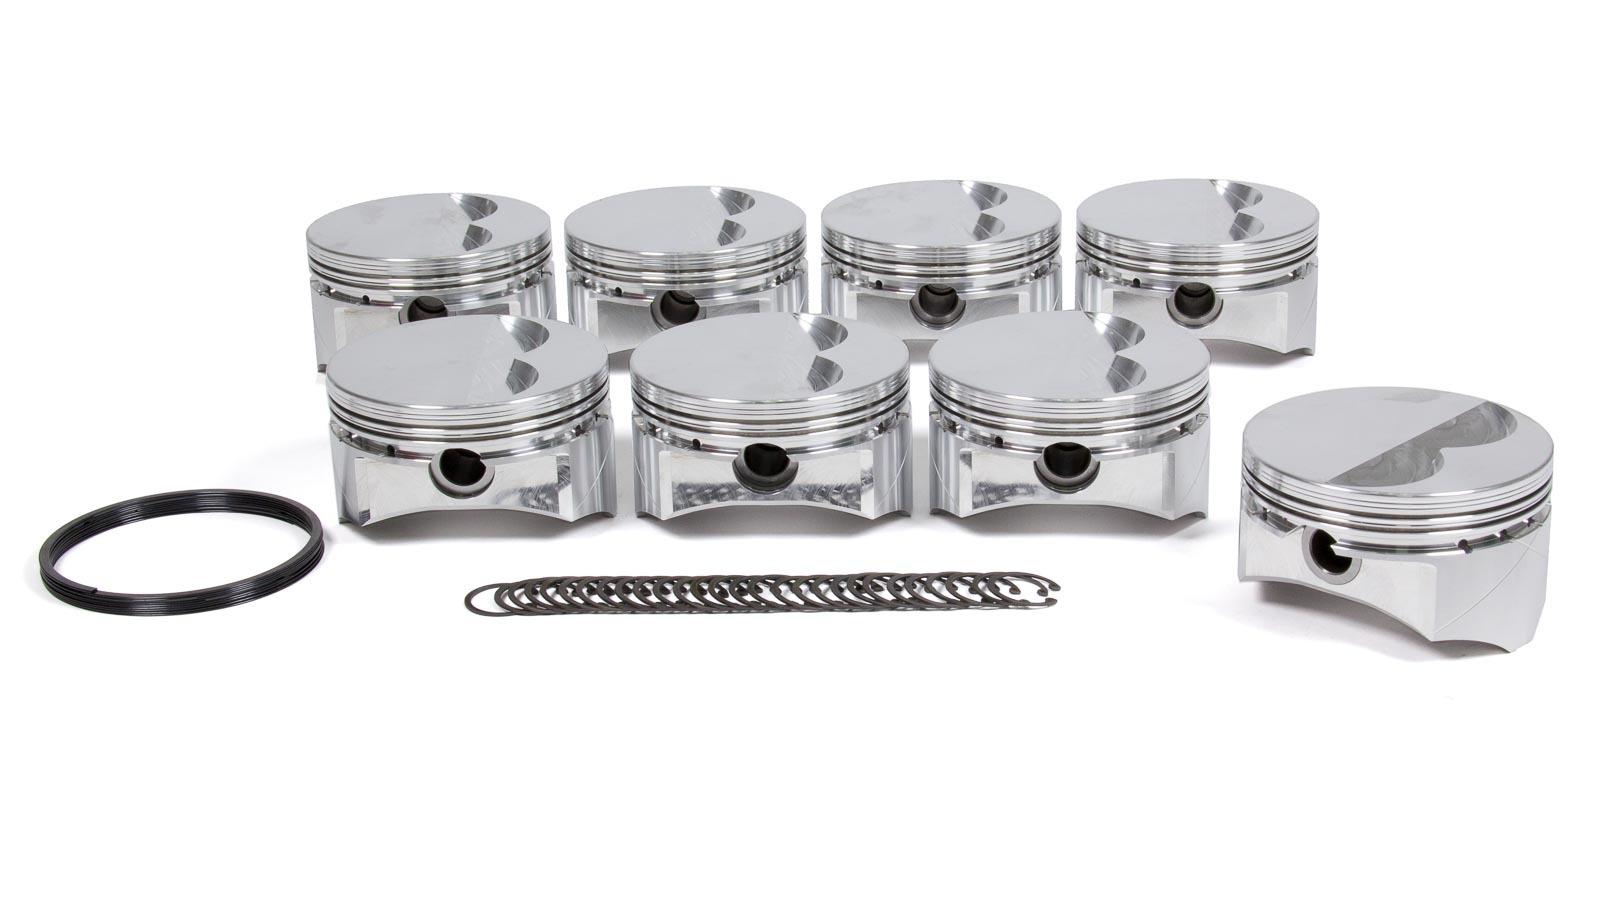 SBC GSX Piston Set 4.030 F/T -5cc